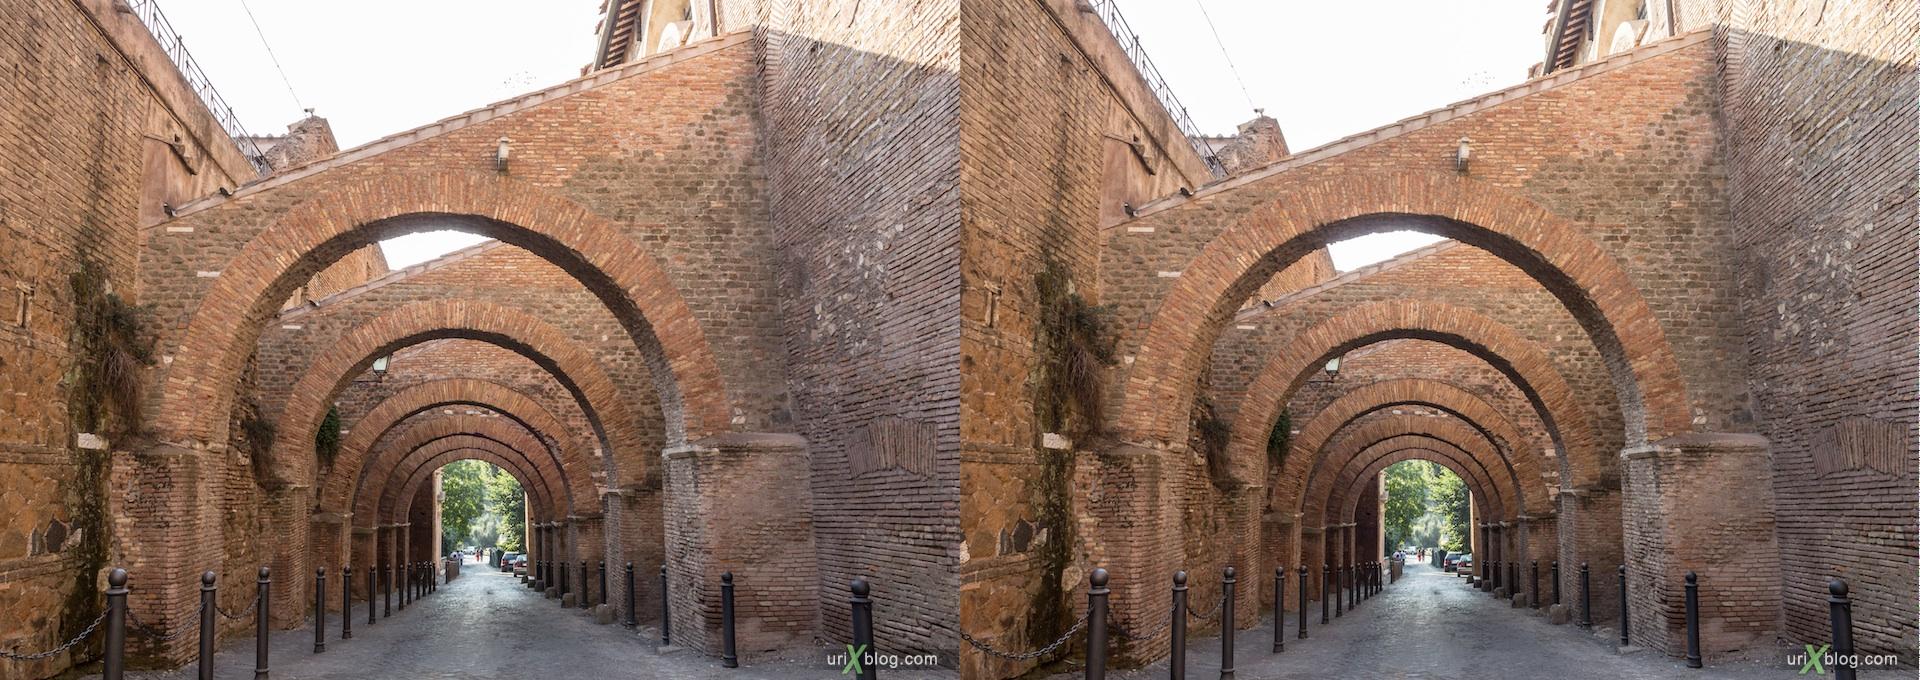 2012, Clivo di Scauro street, Santi Giovanni e Paolo church, 3D, stereo pair, cross-eyed, crossview, cross view stereo pair